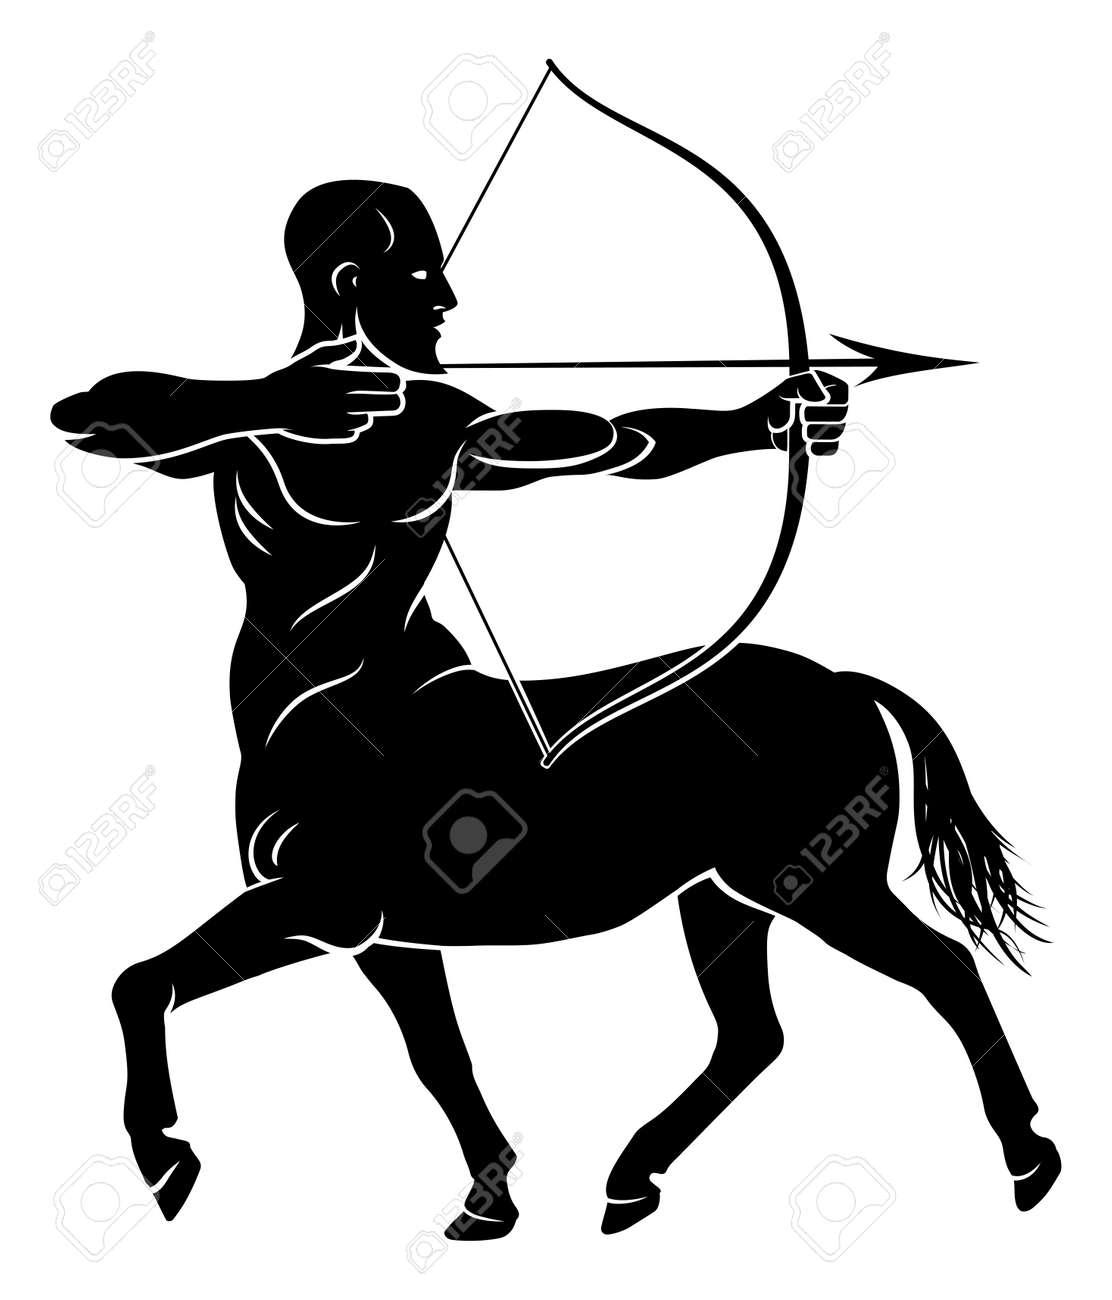 Archer centaur half horse half man character holding a bow and